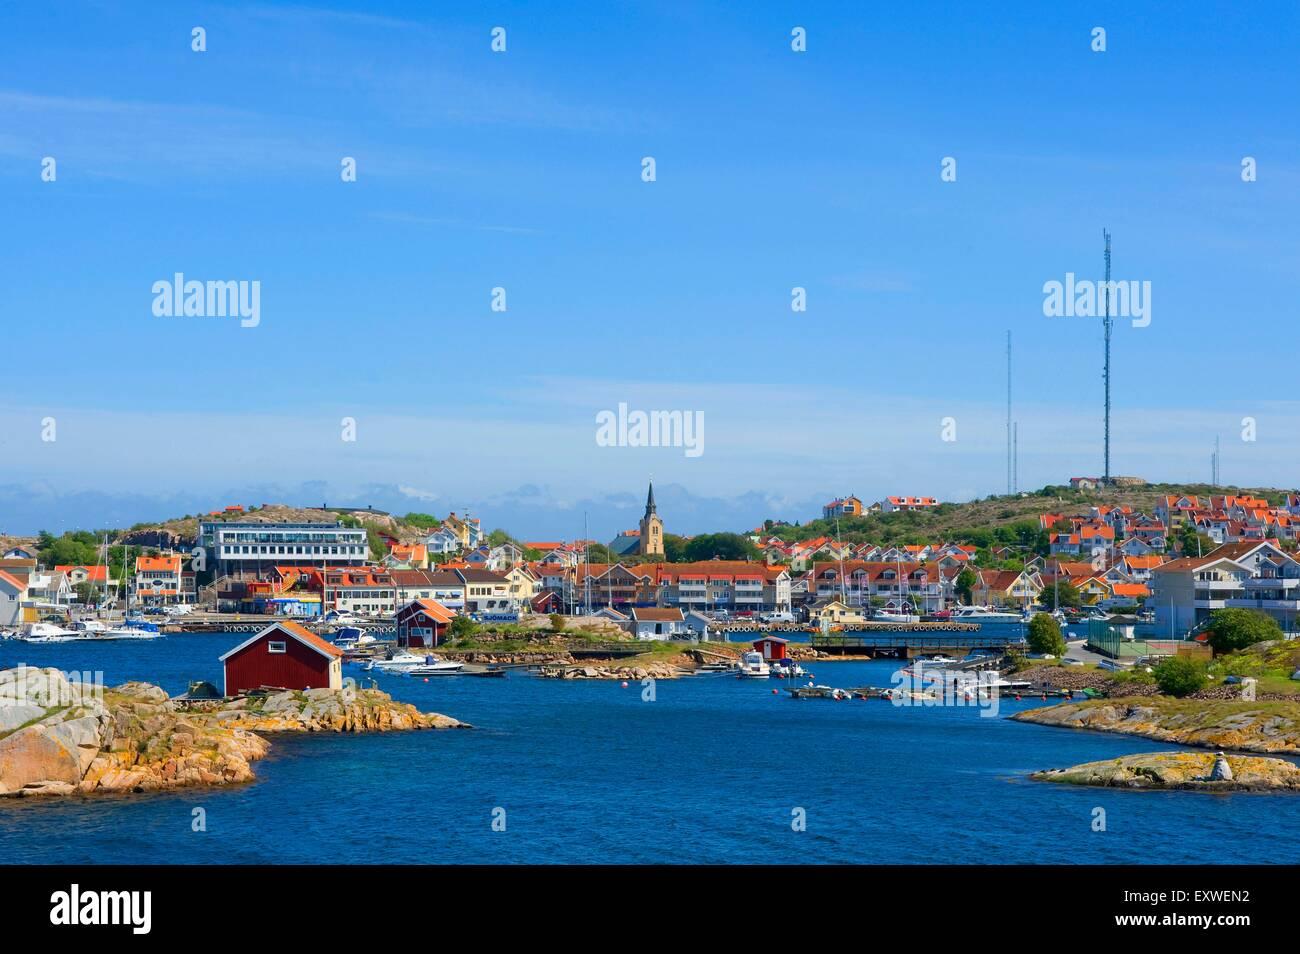 View on Kungshamn, Bohuslaen, Sweden - Stock Image